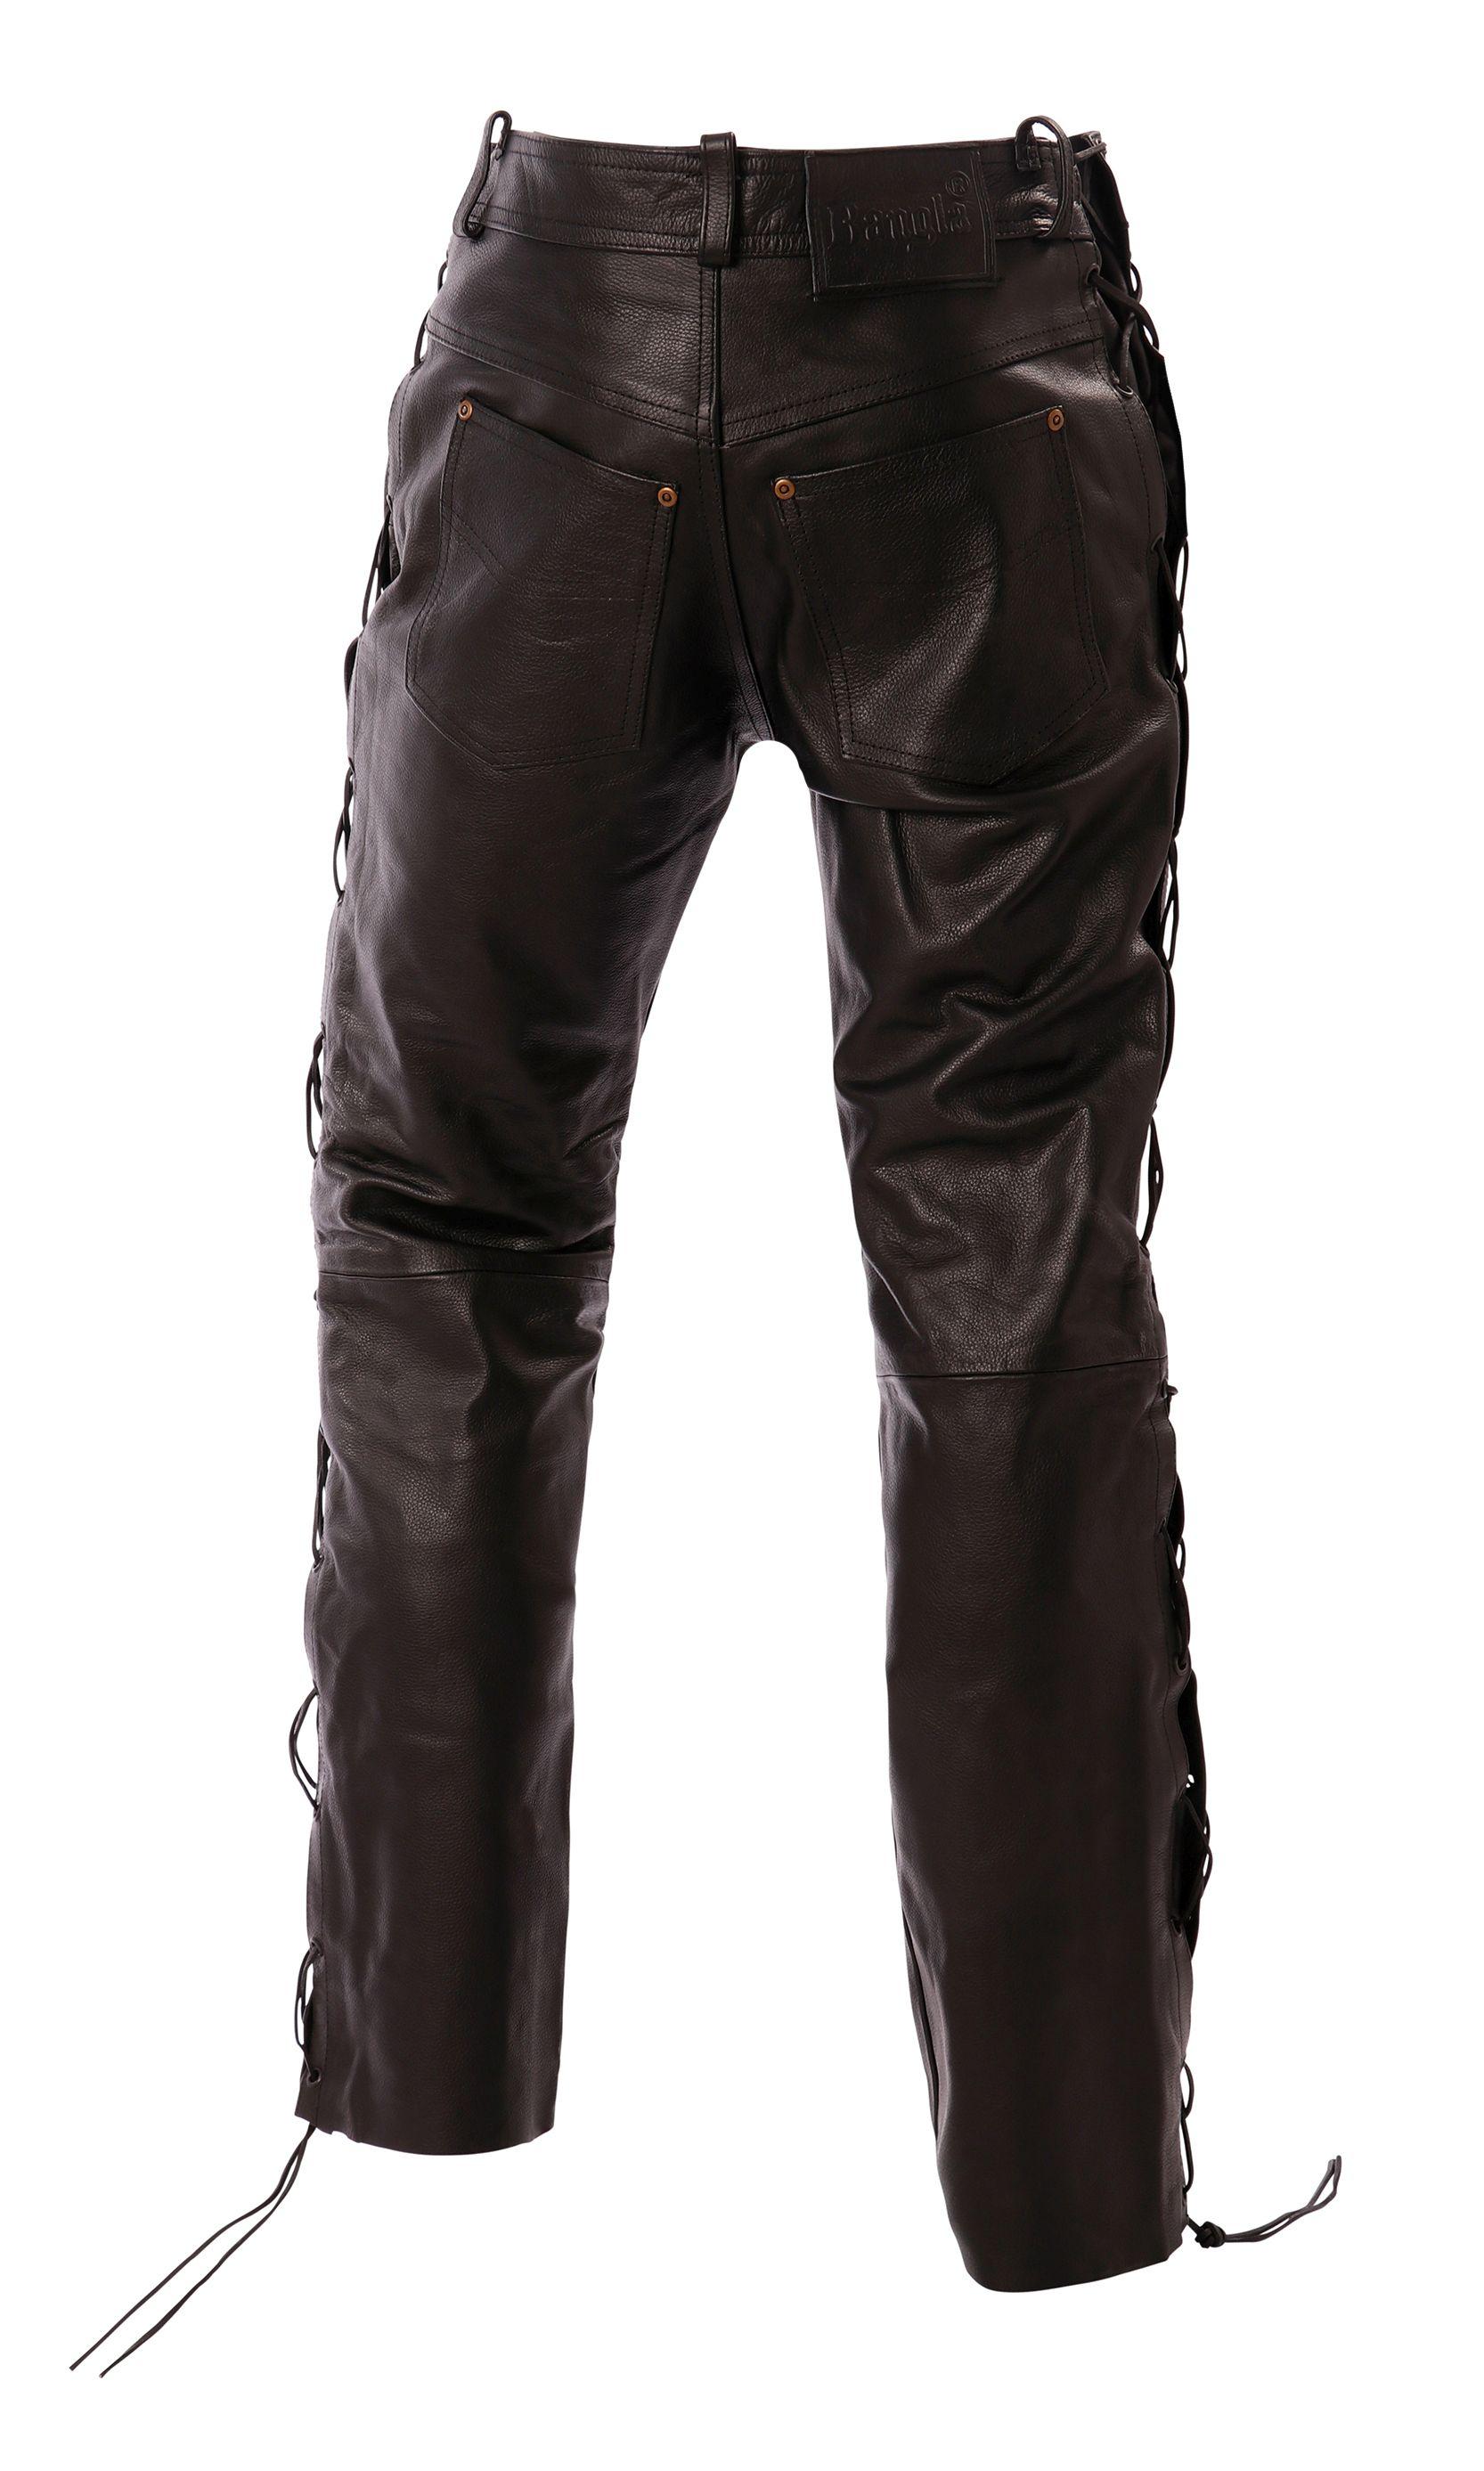 Bangla Schnürjeans Lederhose Bikerjeans Hose Schwarz 29 - 34 inch